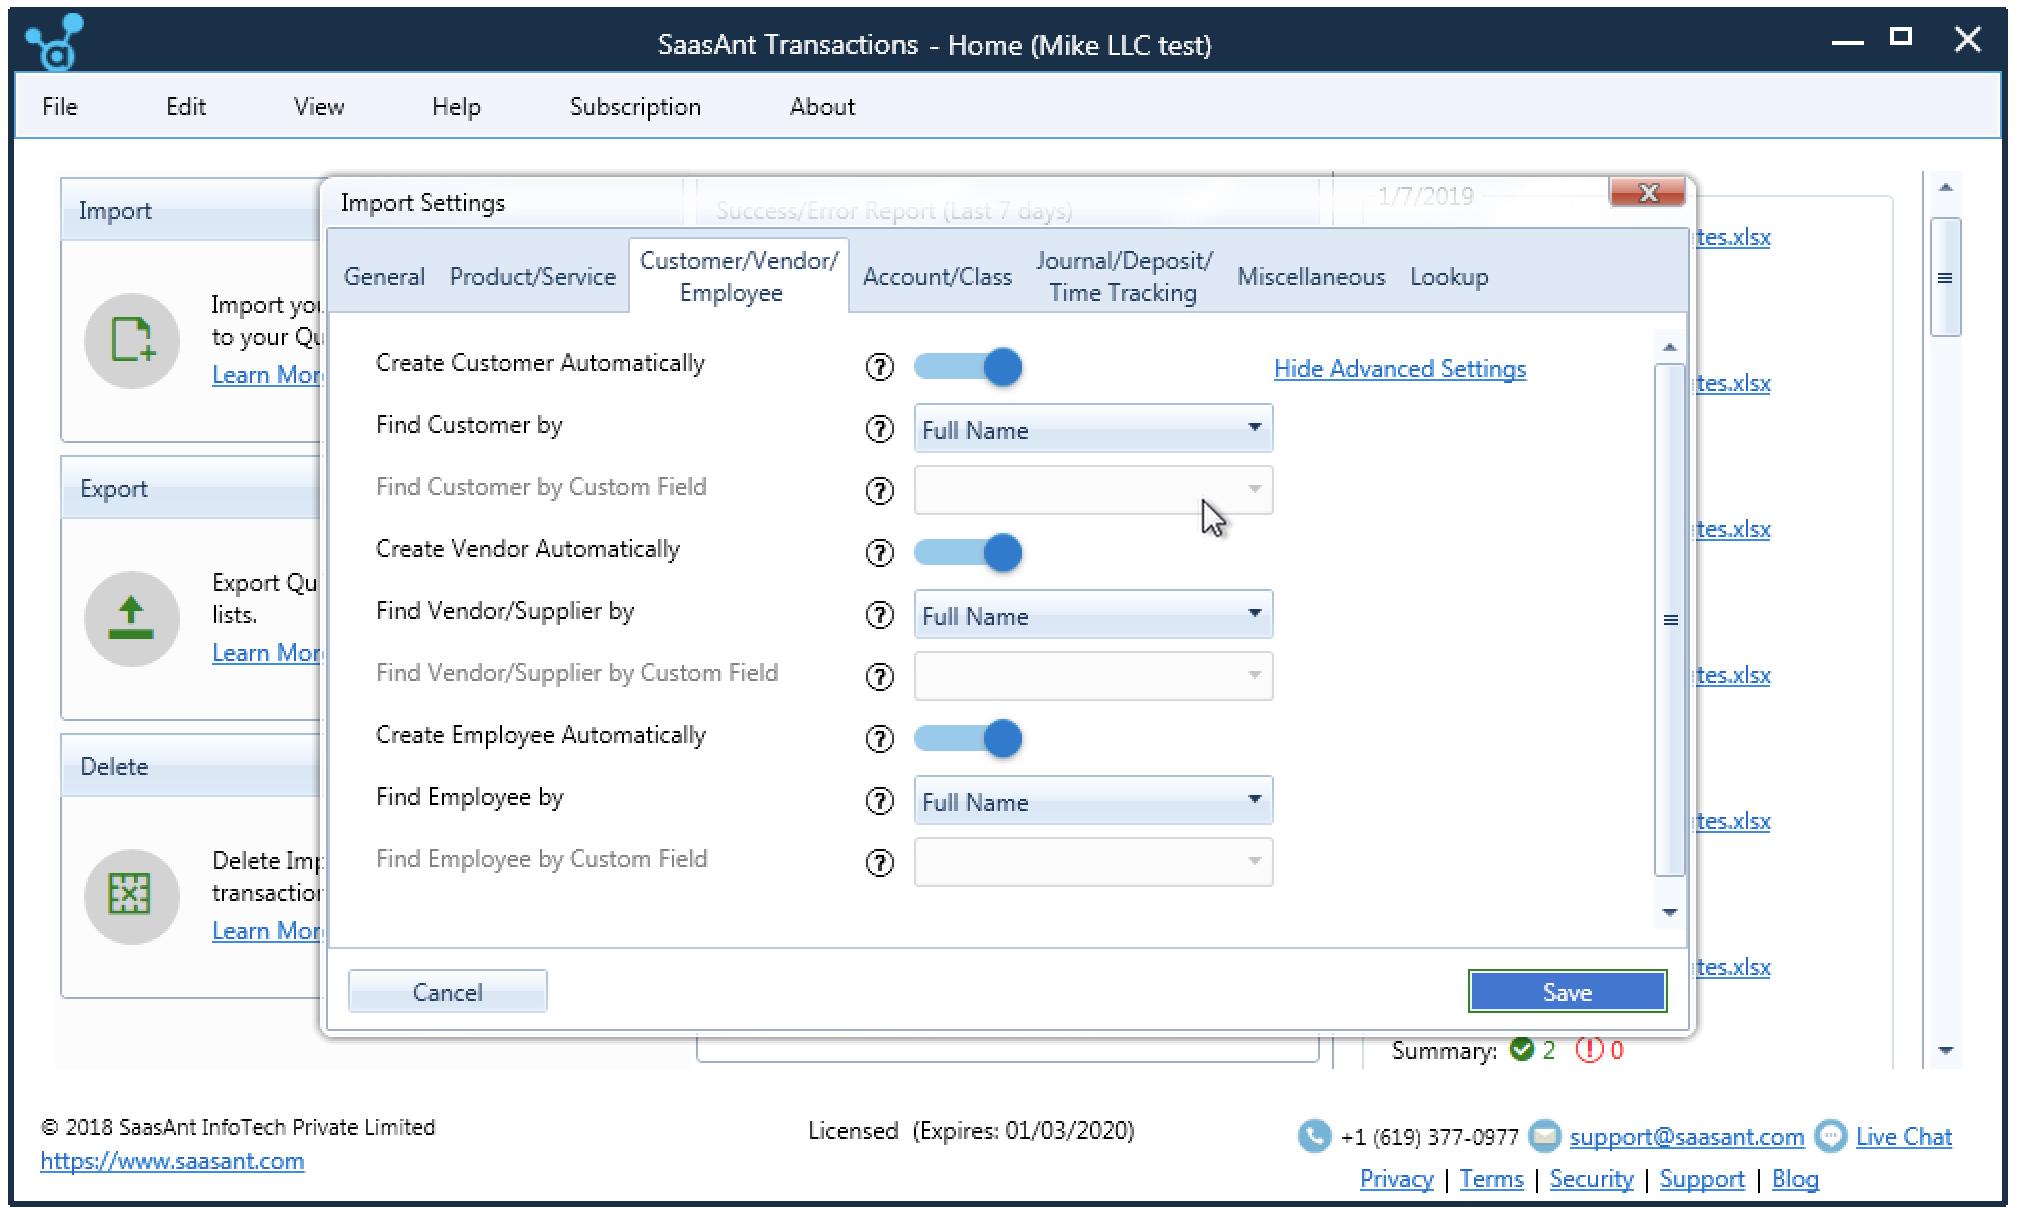 customer/vendor/employee import settings